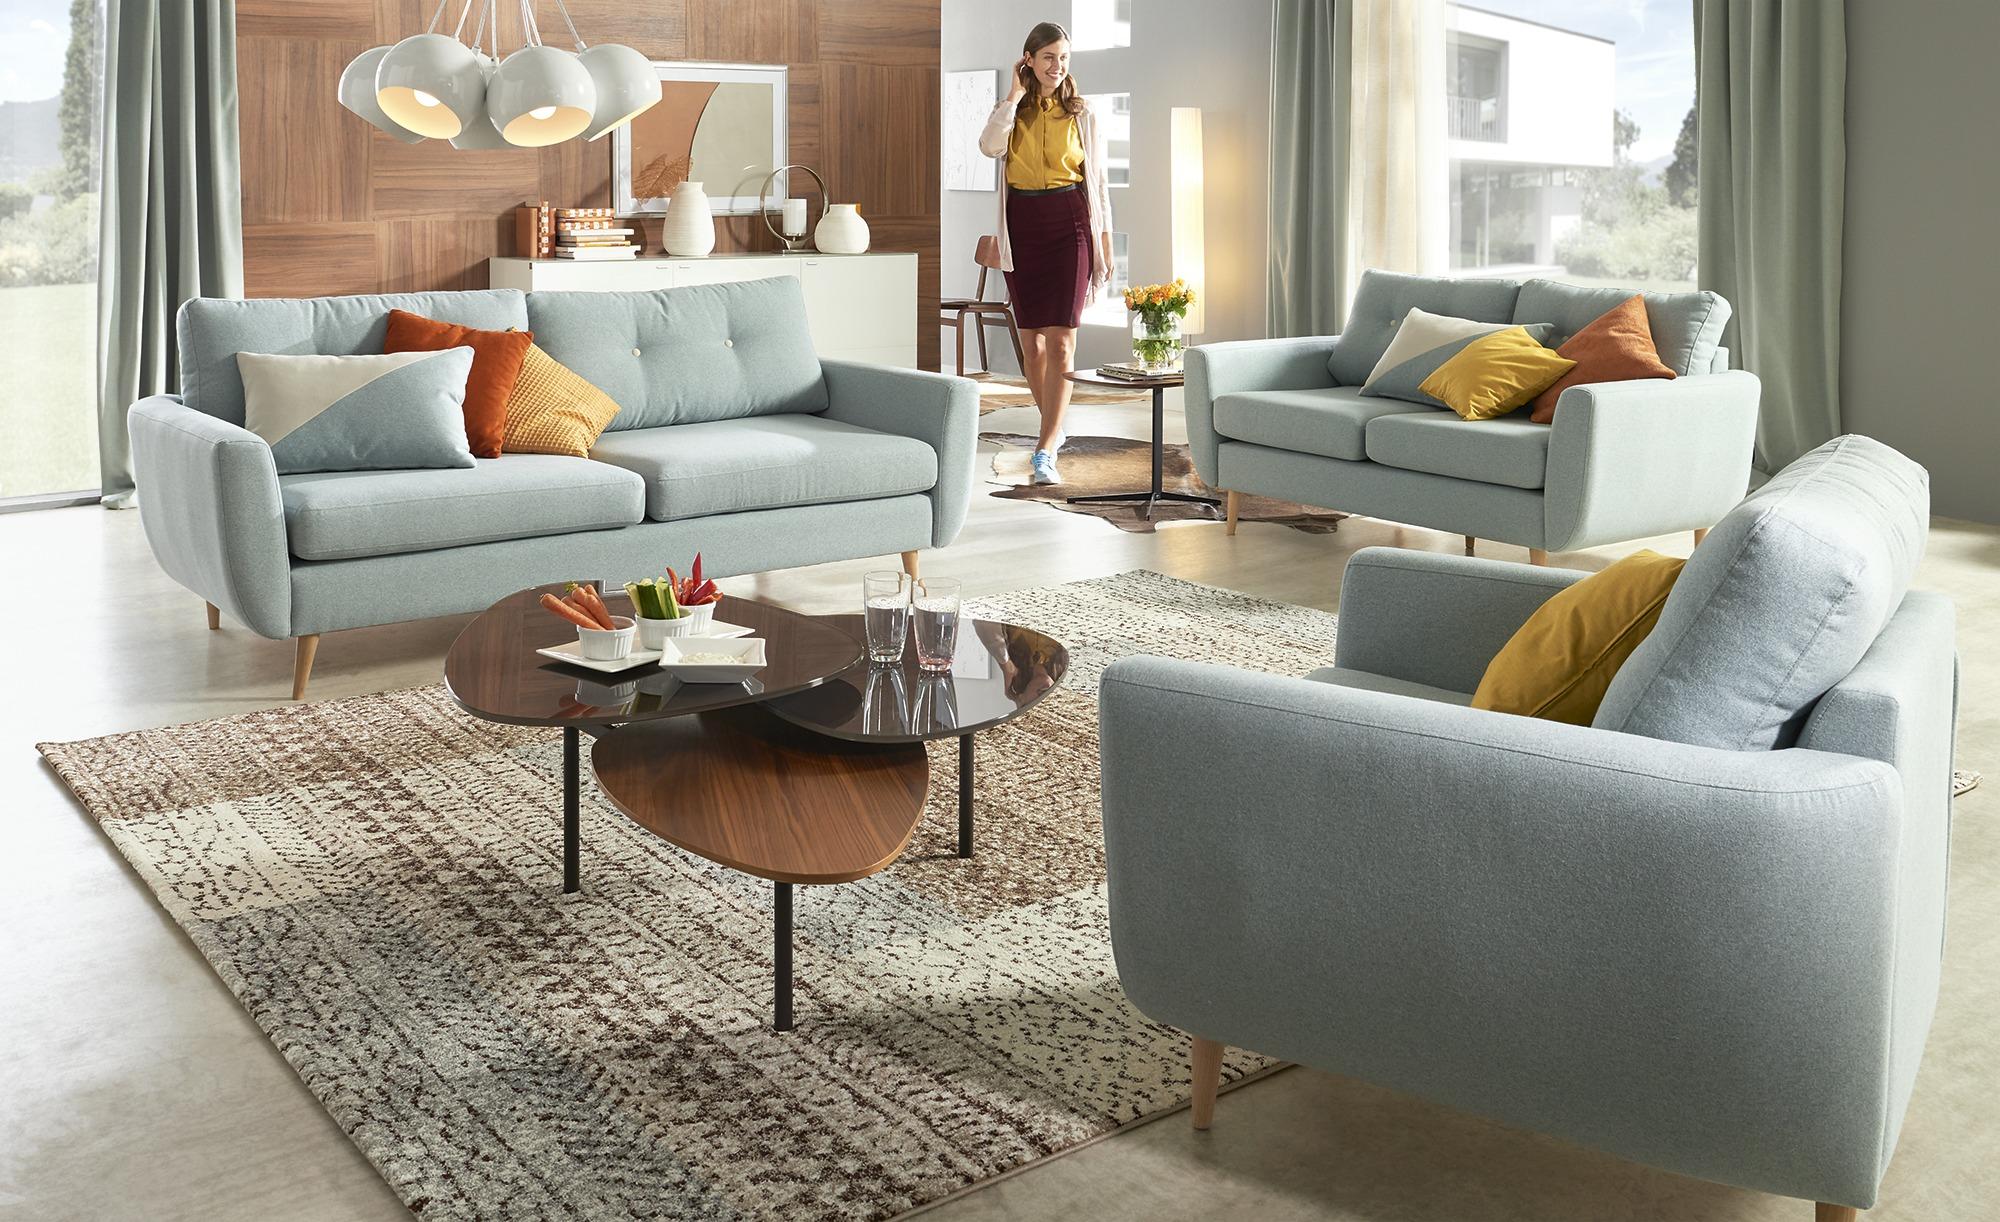 Finya Retro Sofa 3 Sitzig Mintgrun Webstoff Harris In 2020 Sofa Furniture Retro Sofa Furniture